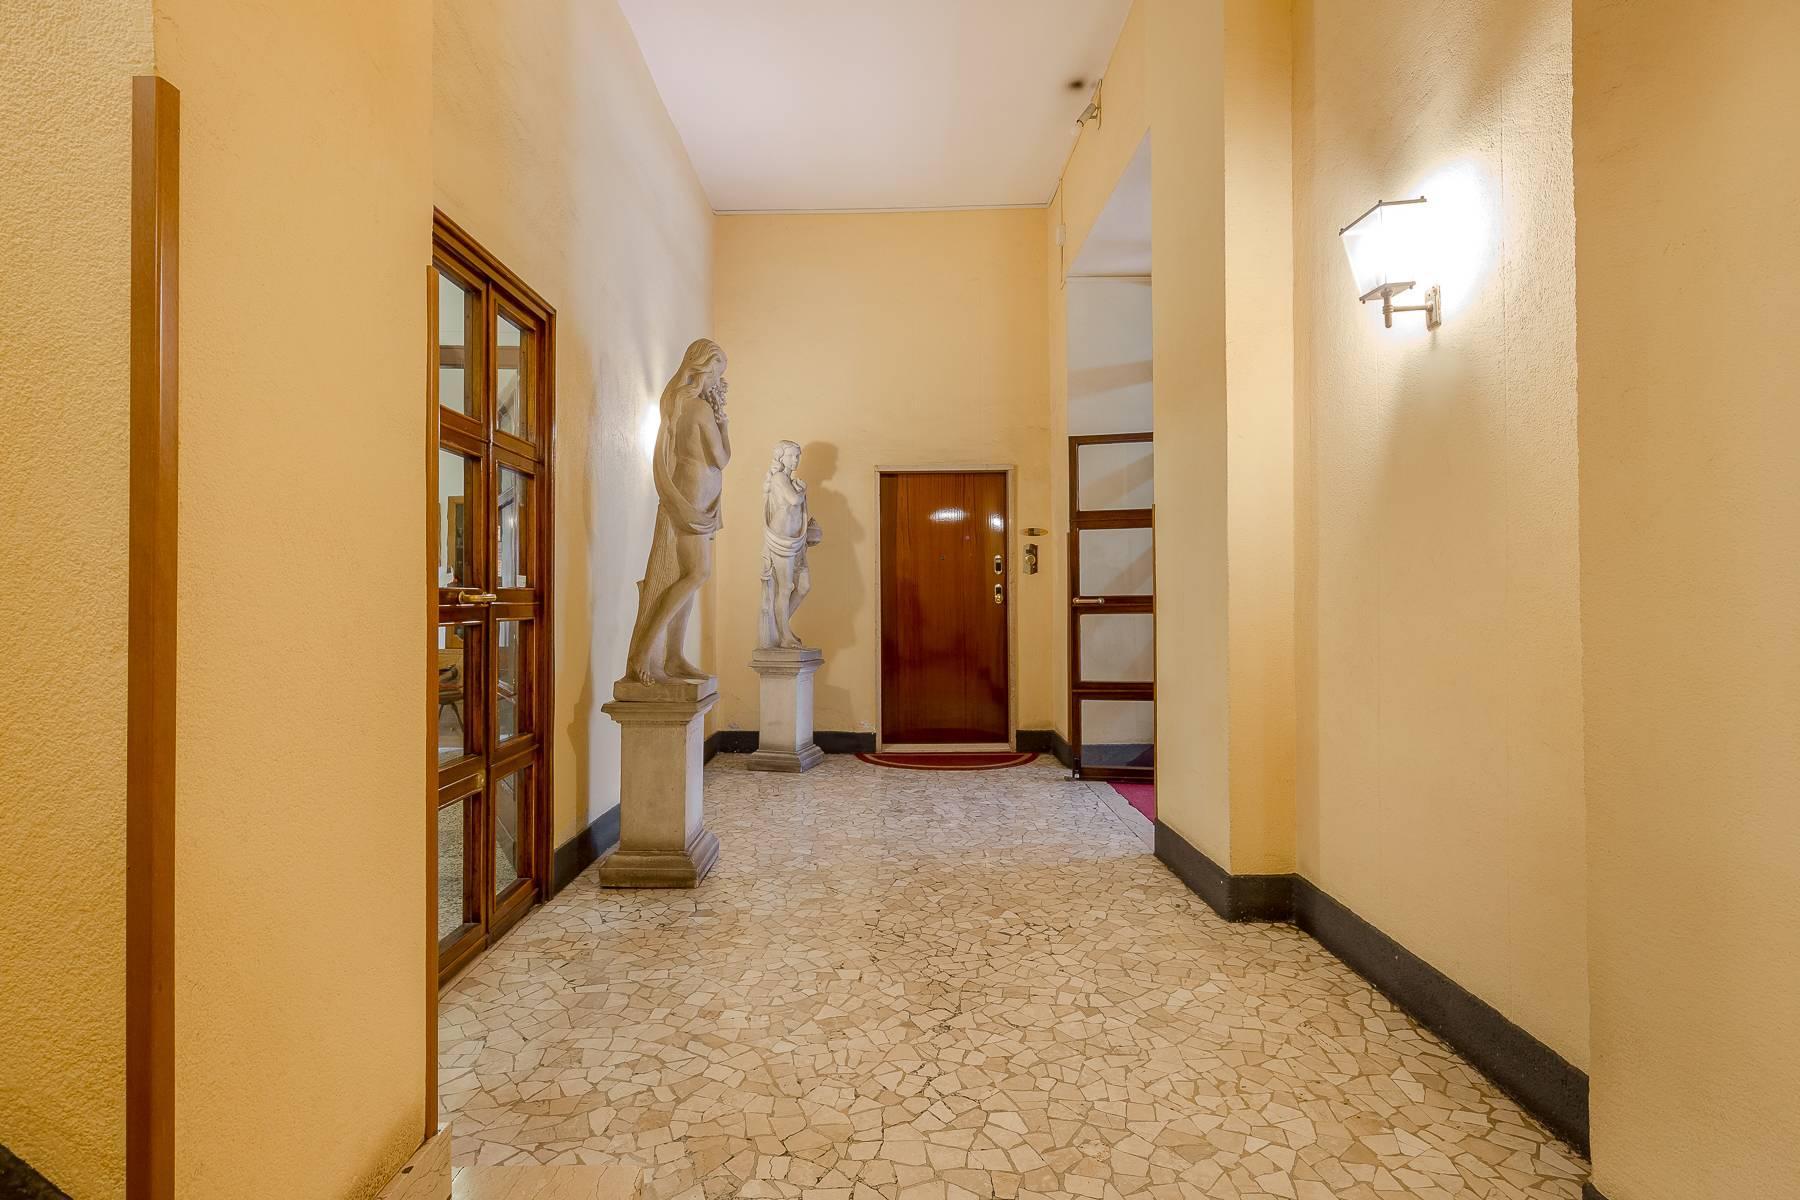 Opne-Space Büro / Wohnimmobilie auf der Piazza Giovine Italia / Via Aurelio Saffi - 2